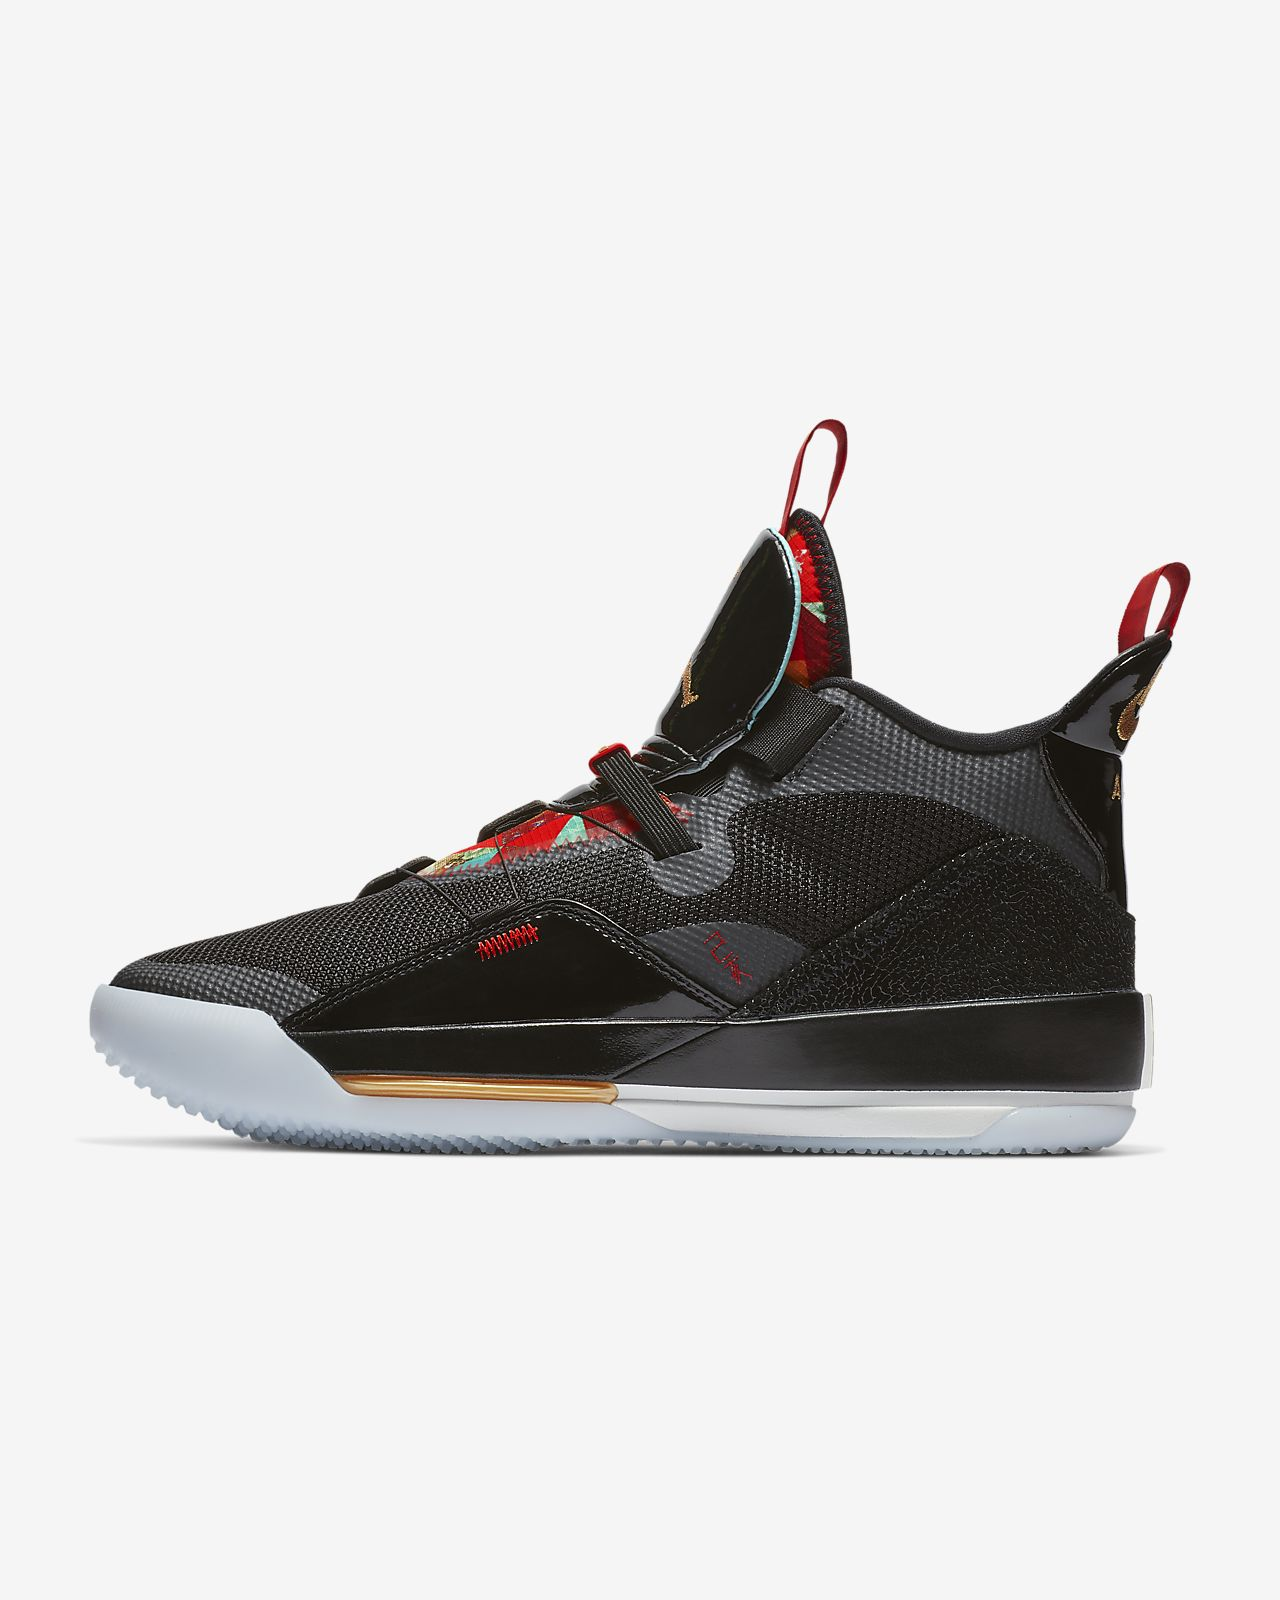 28537b10 Low Resolution Air Jordan XXXIII Zapatillas de baloncesto Air Jordan XXXIII  Zapatillas de baloncesto